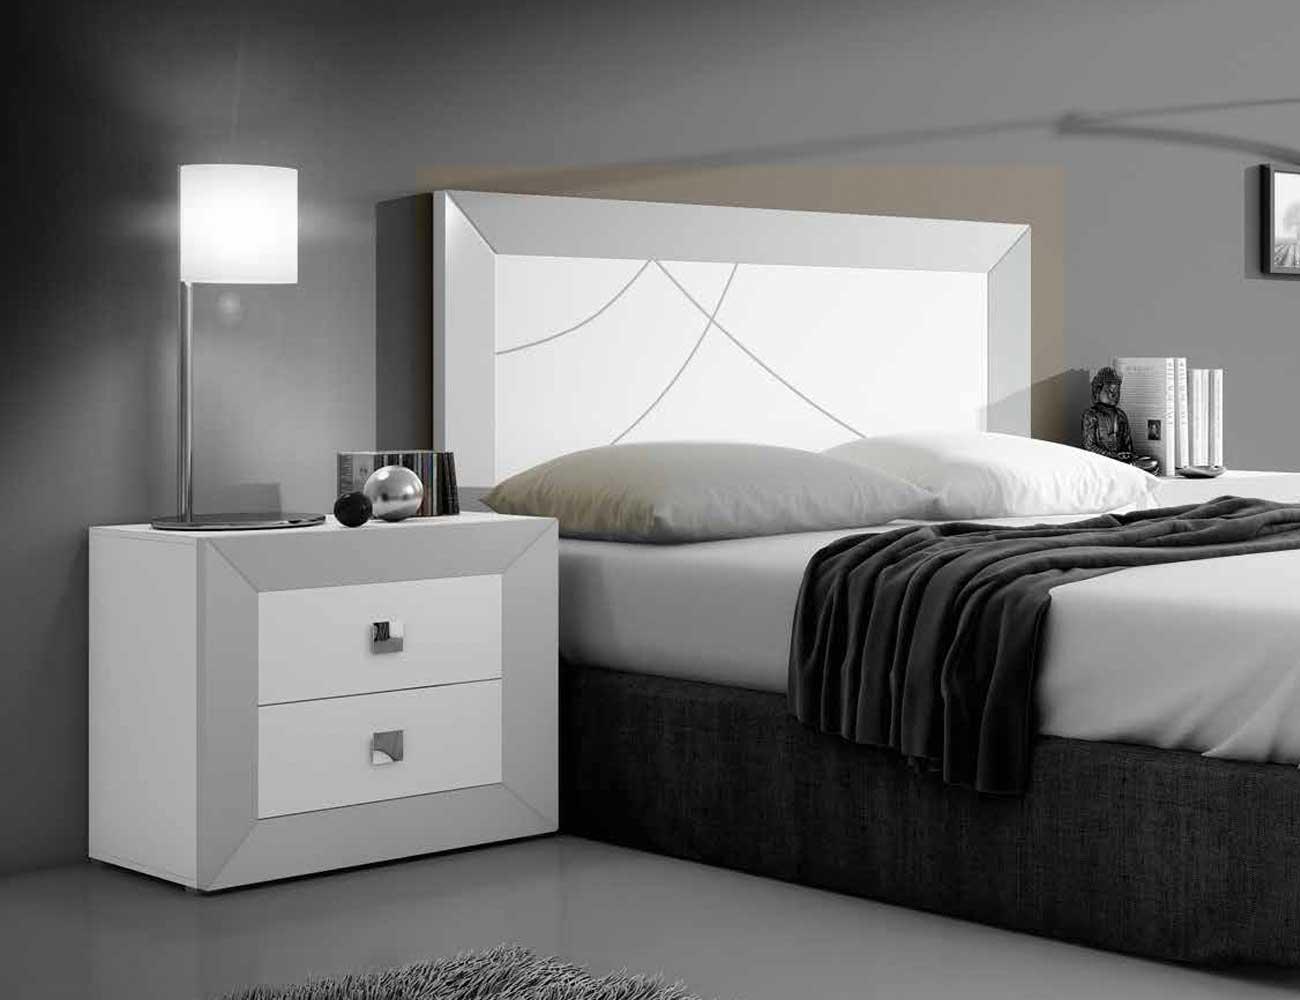 Dormitorio de matrimonio moderno en blanco con plata 2441 for Dormitorios modernos en blanco y plata